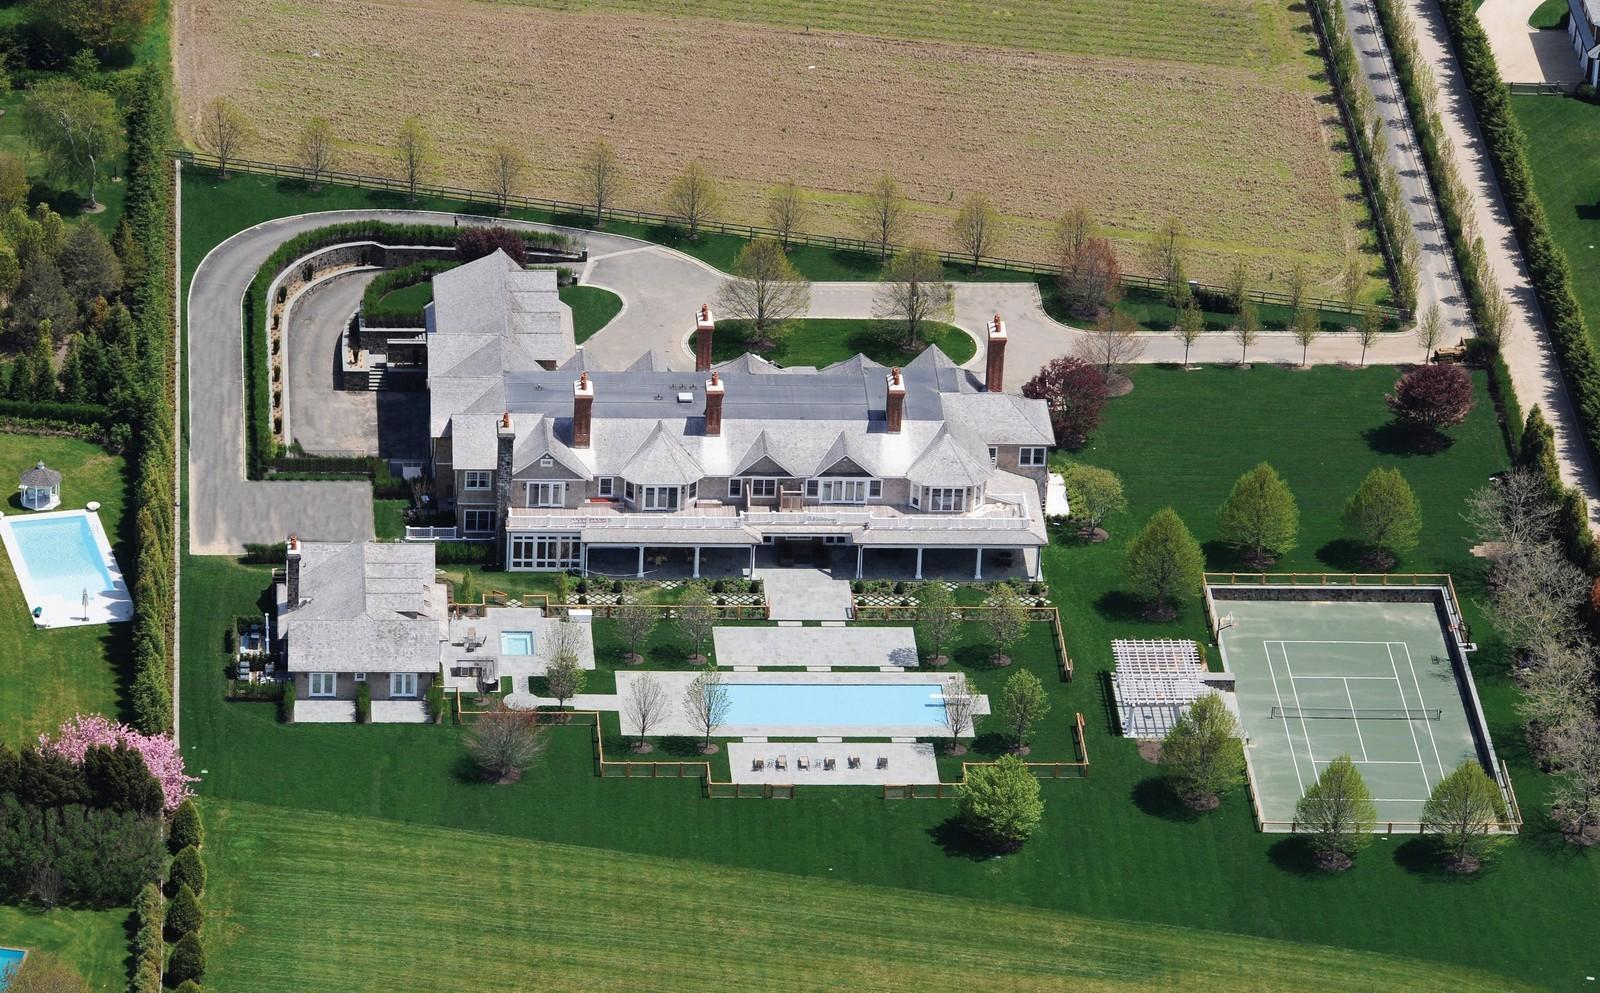 Real Estate Photography - 612 halsey lane, bridgehampton, NY, 11932 - Aerial View